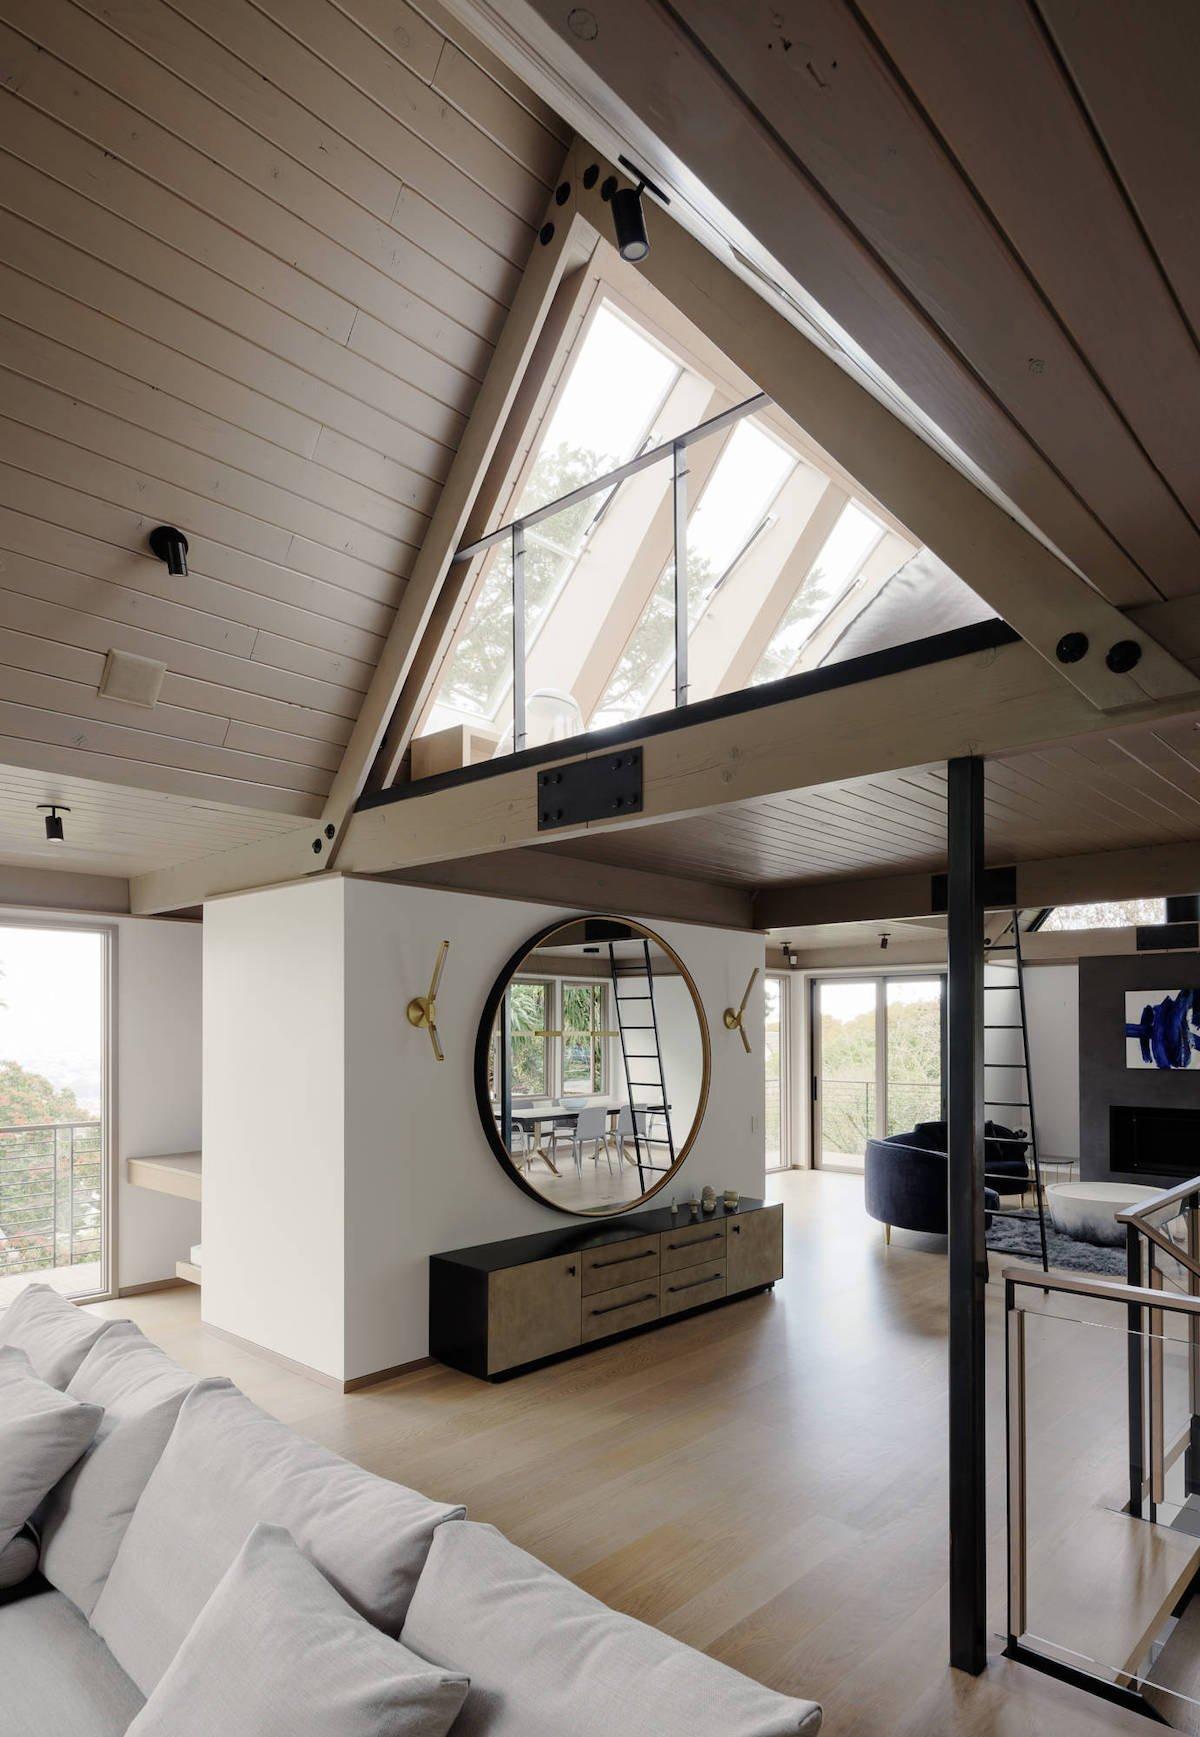 salon spacieux mezzanine triangle parquet bois canapé blanc clem around the corner